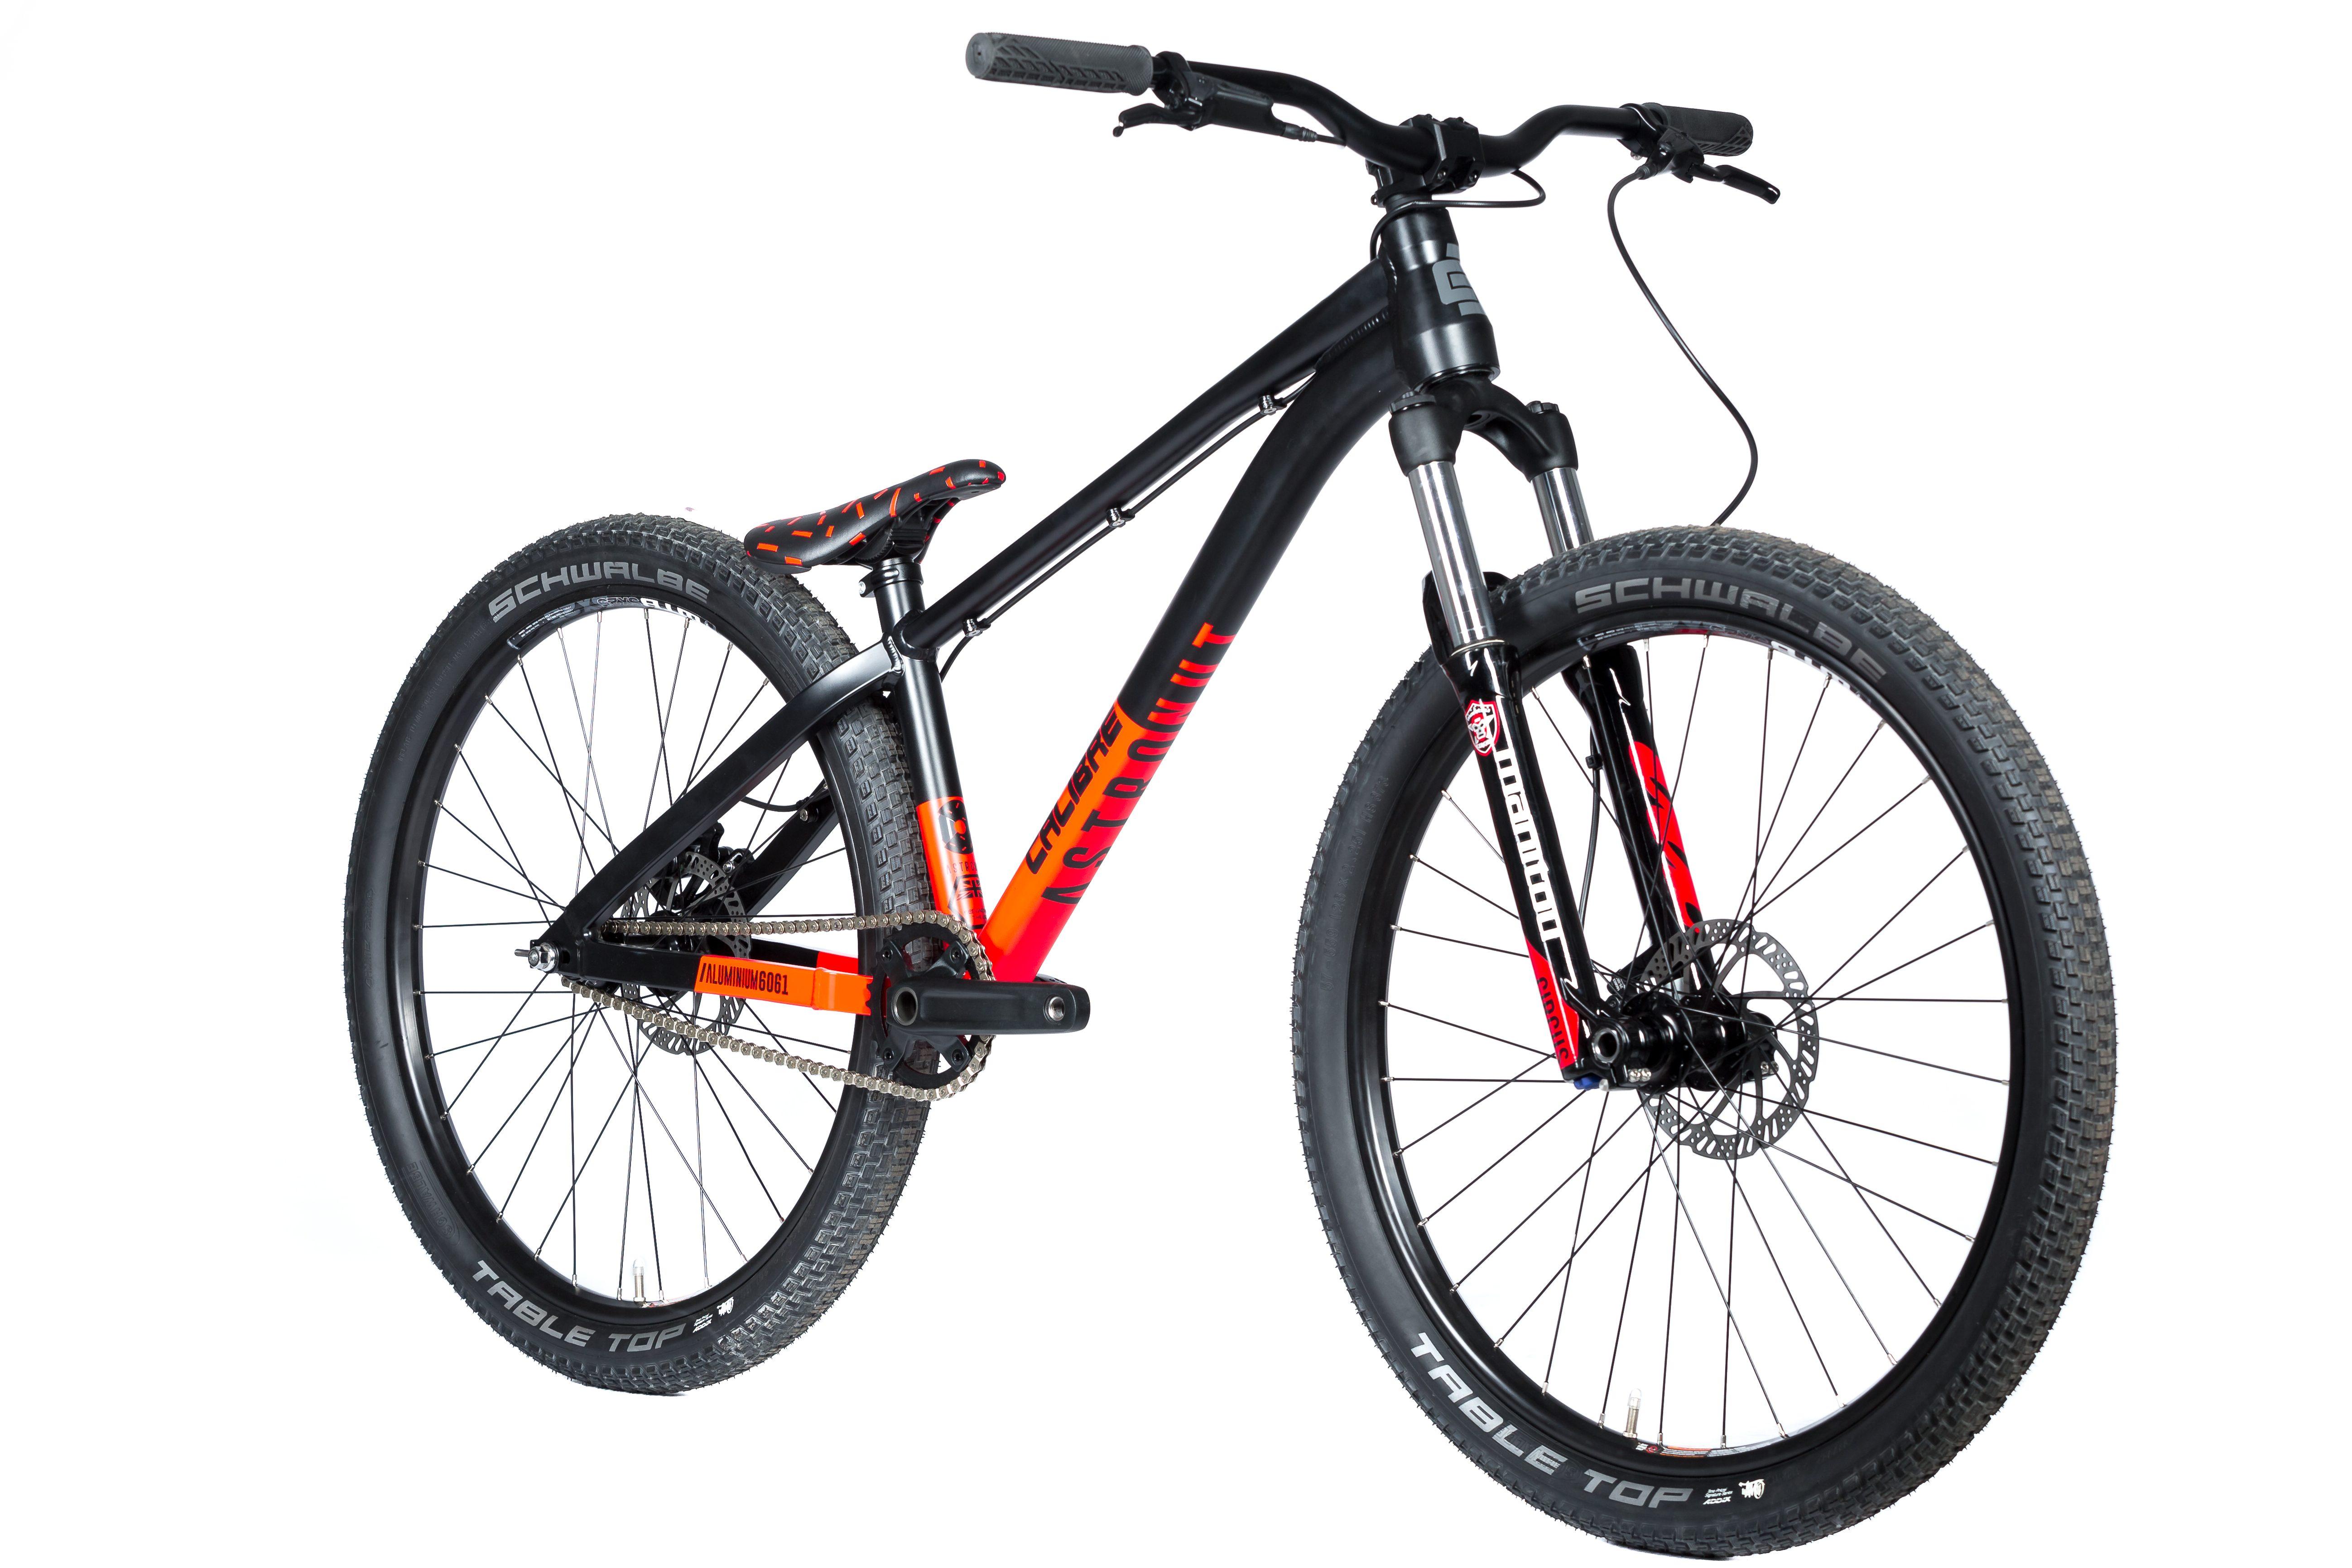 Calibre Astronut dirt jump bike #26aintdead - MBR